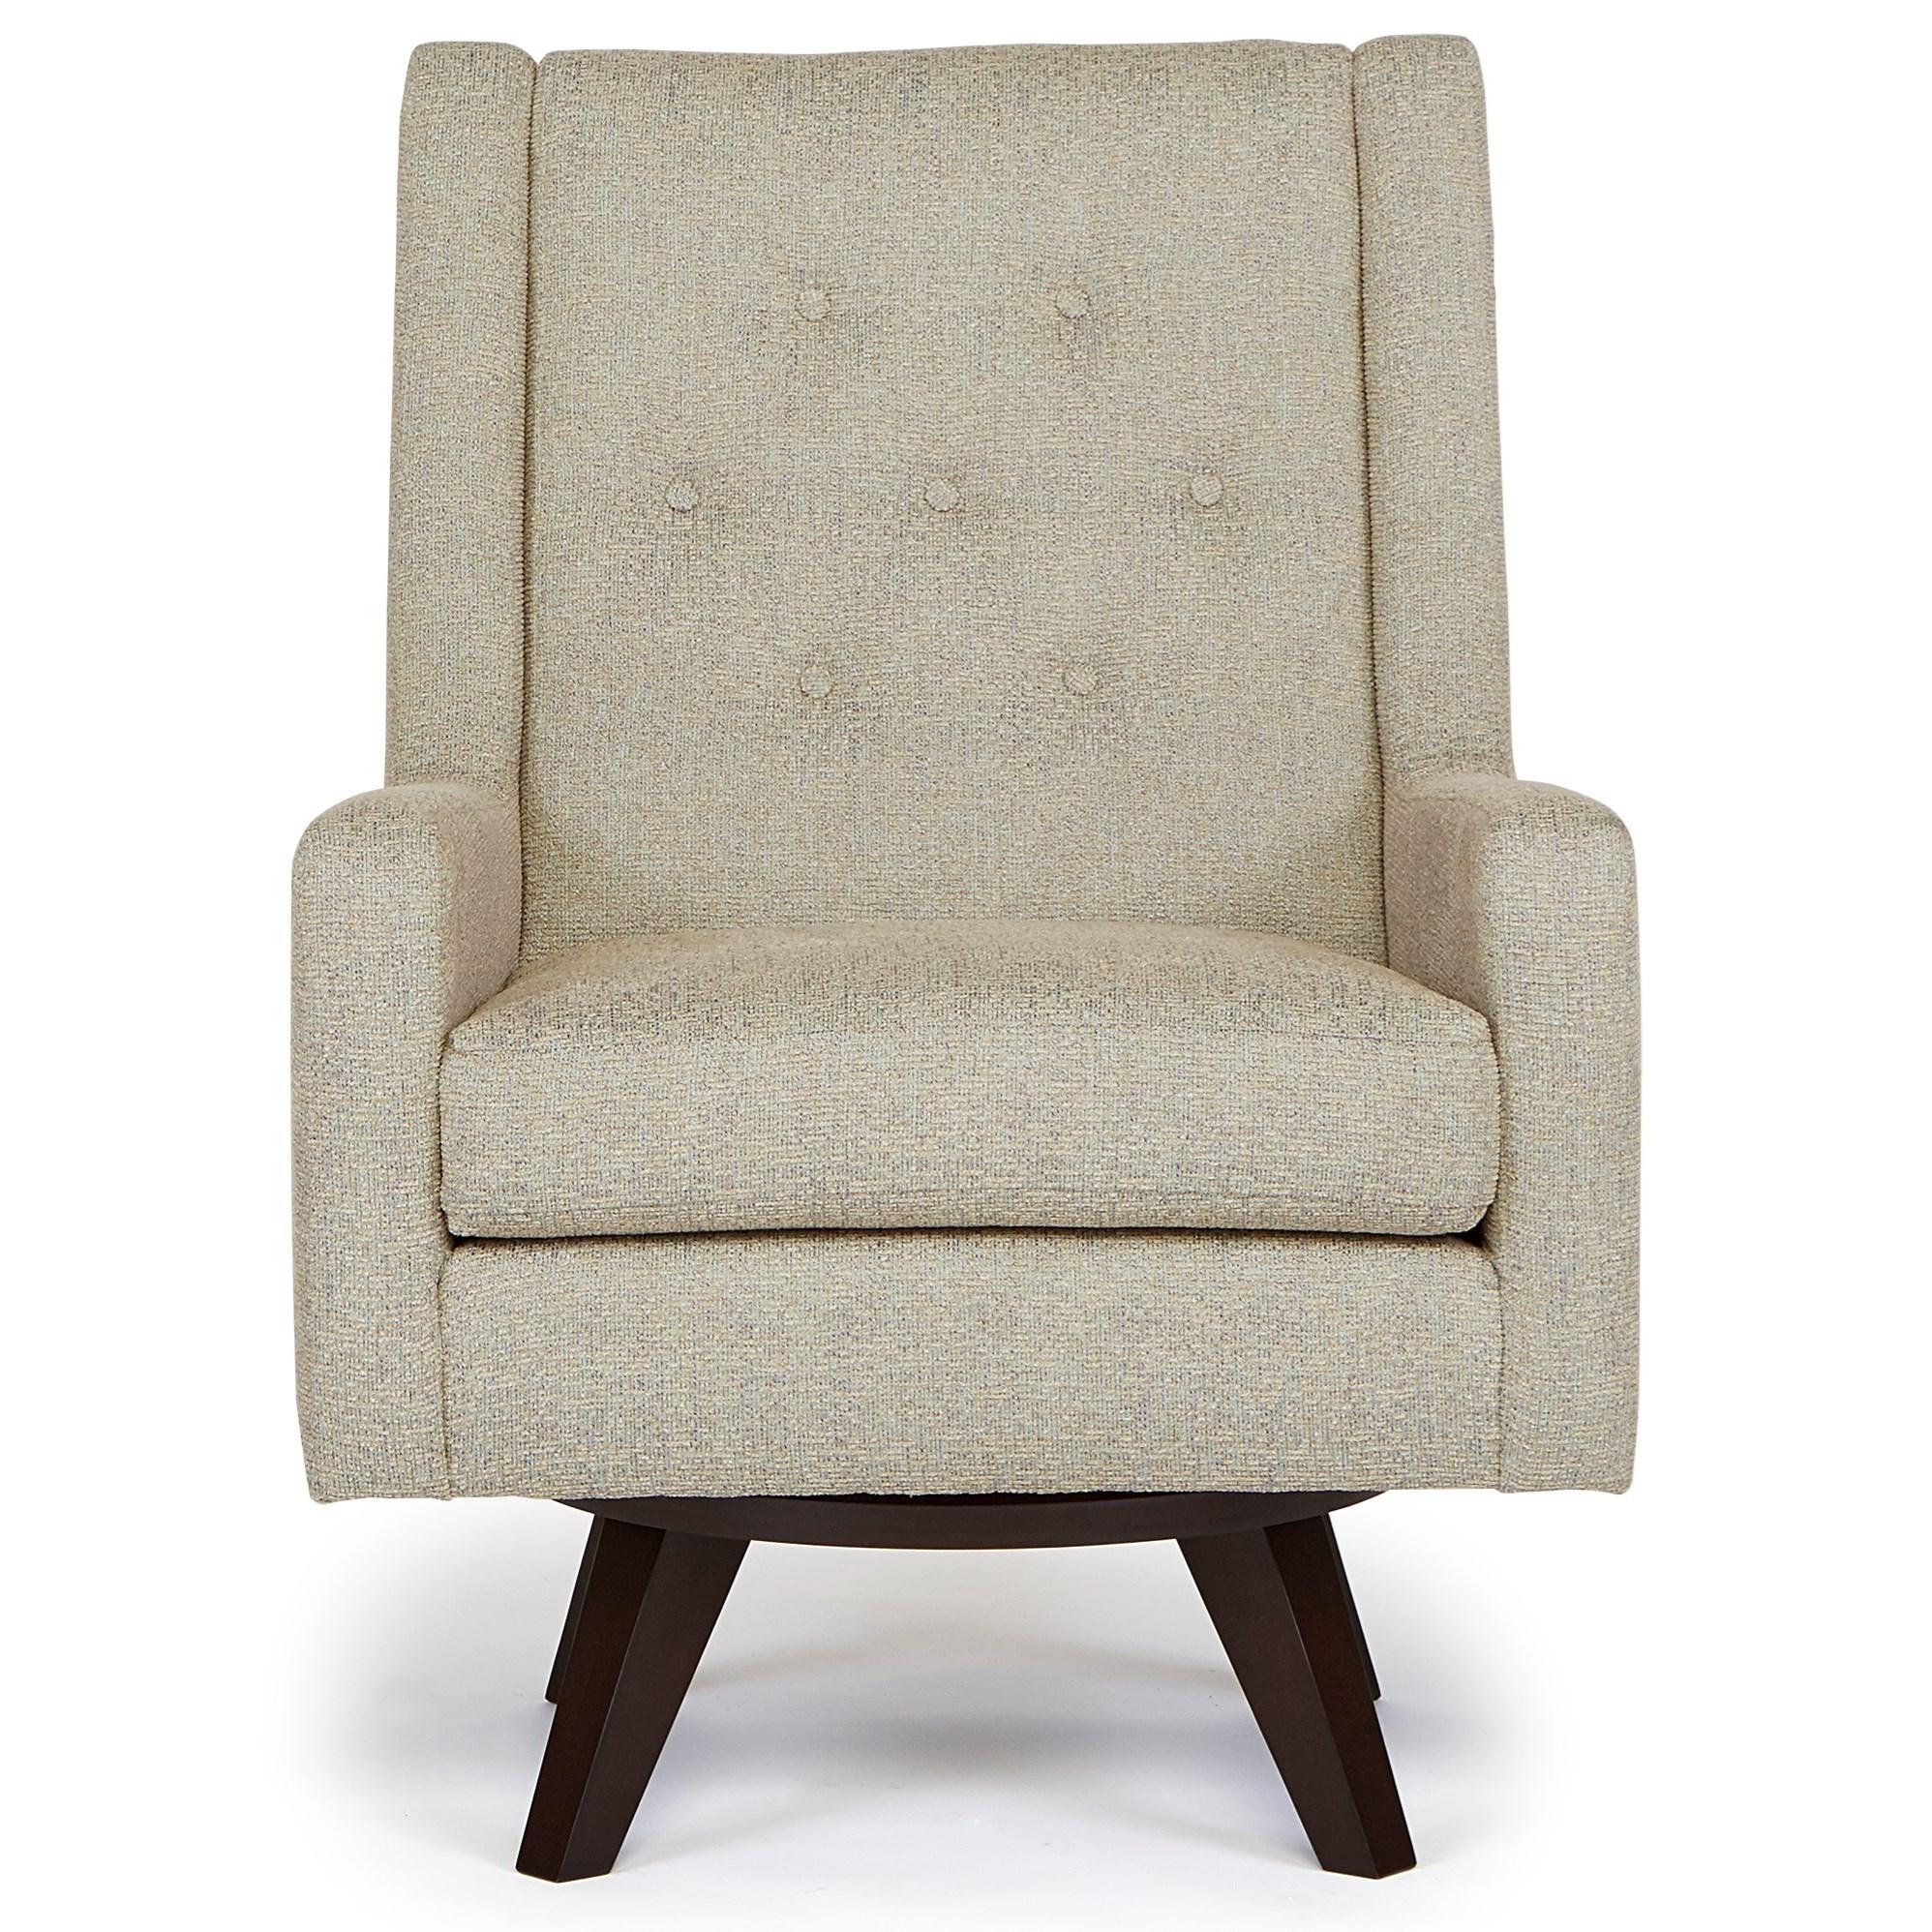 Best Home Furnishings Chairs Swivel Barrel 2518 Kale